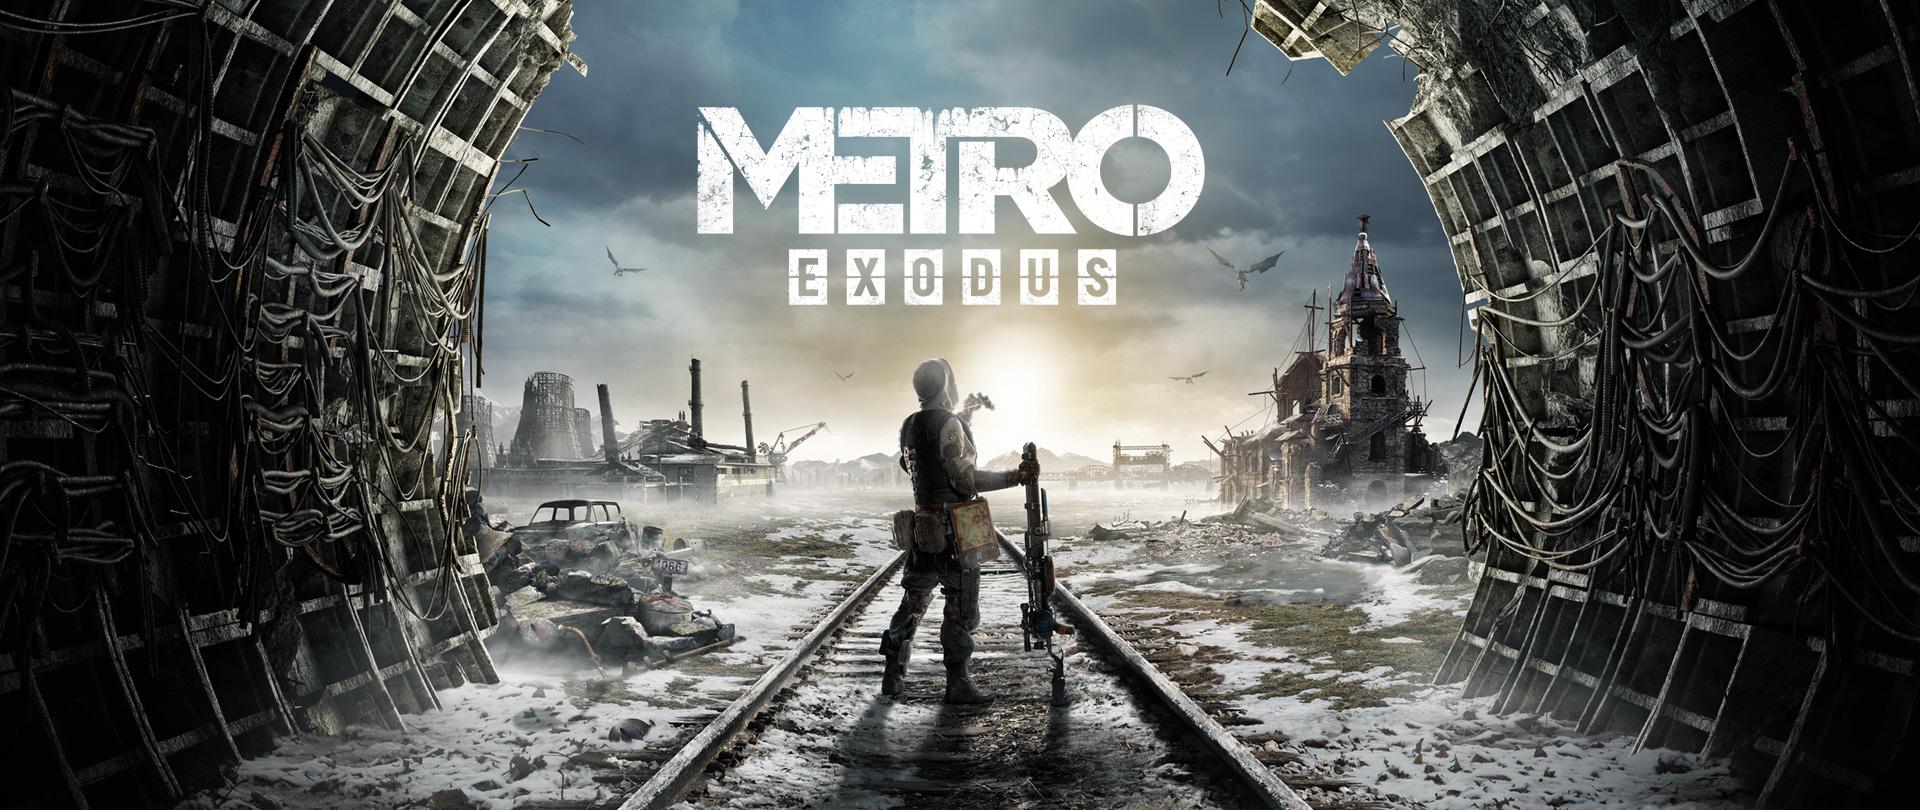 Metro Exodus รถด่วนขบวนระทึก!